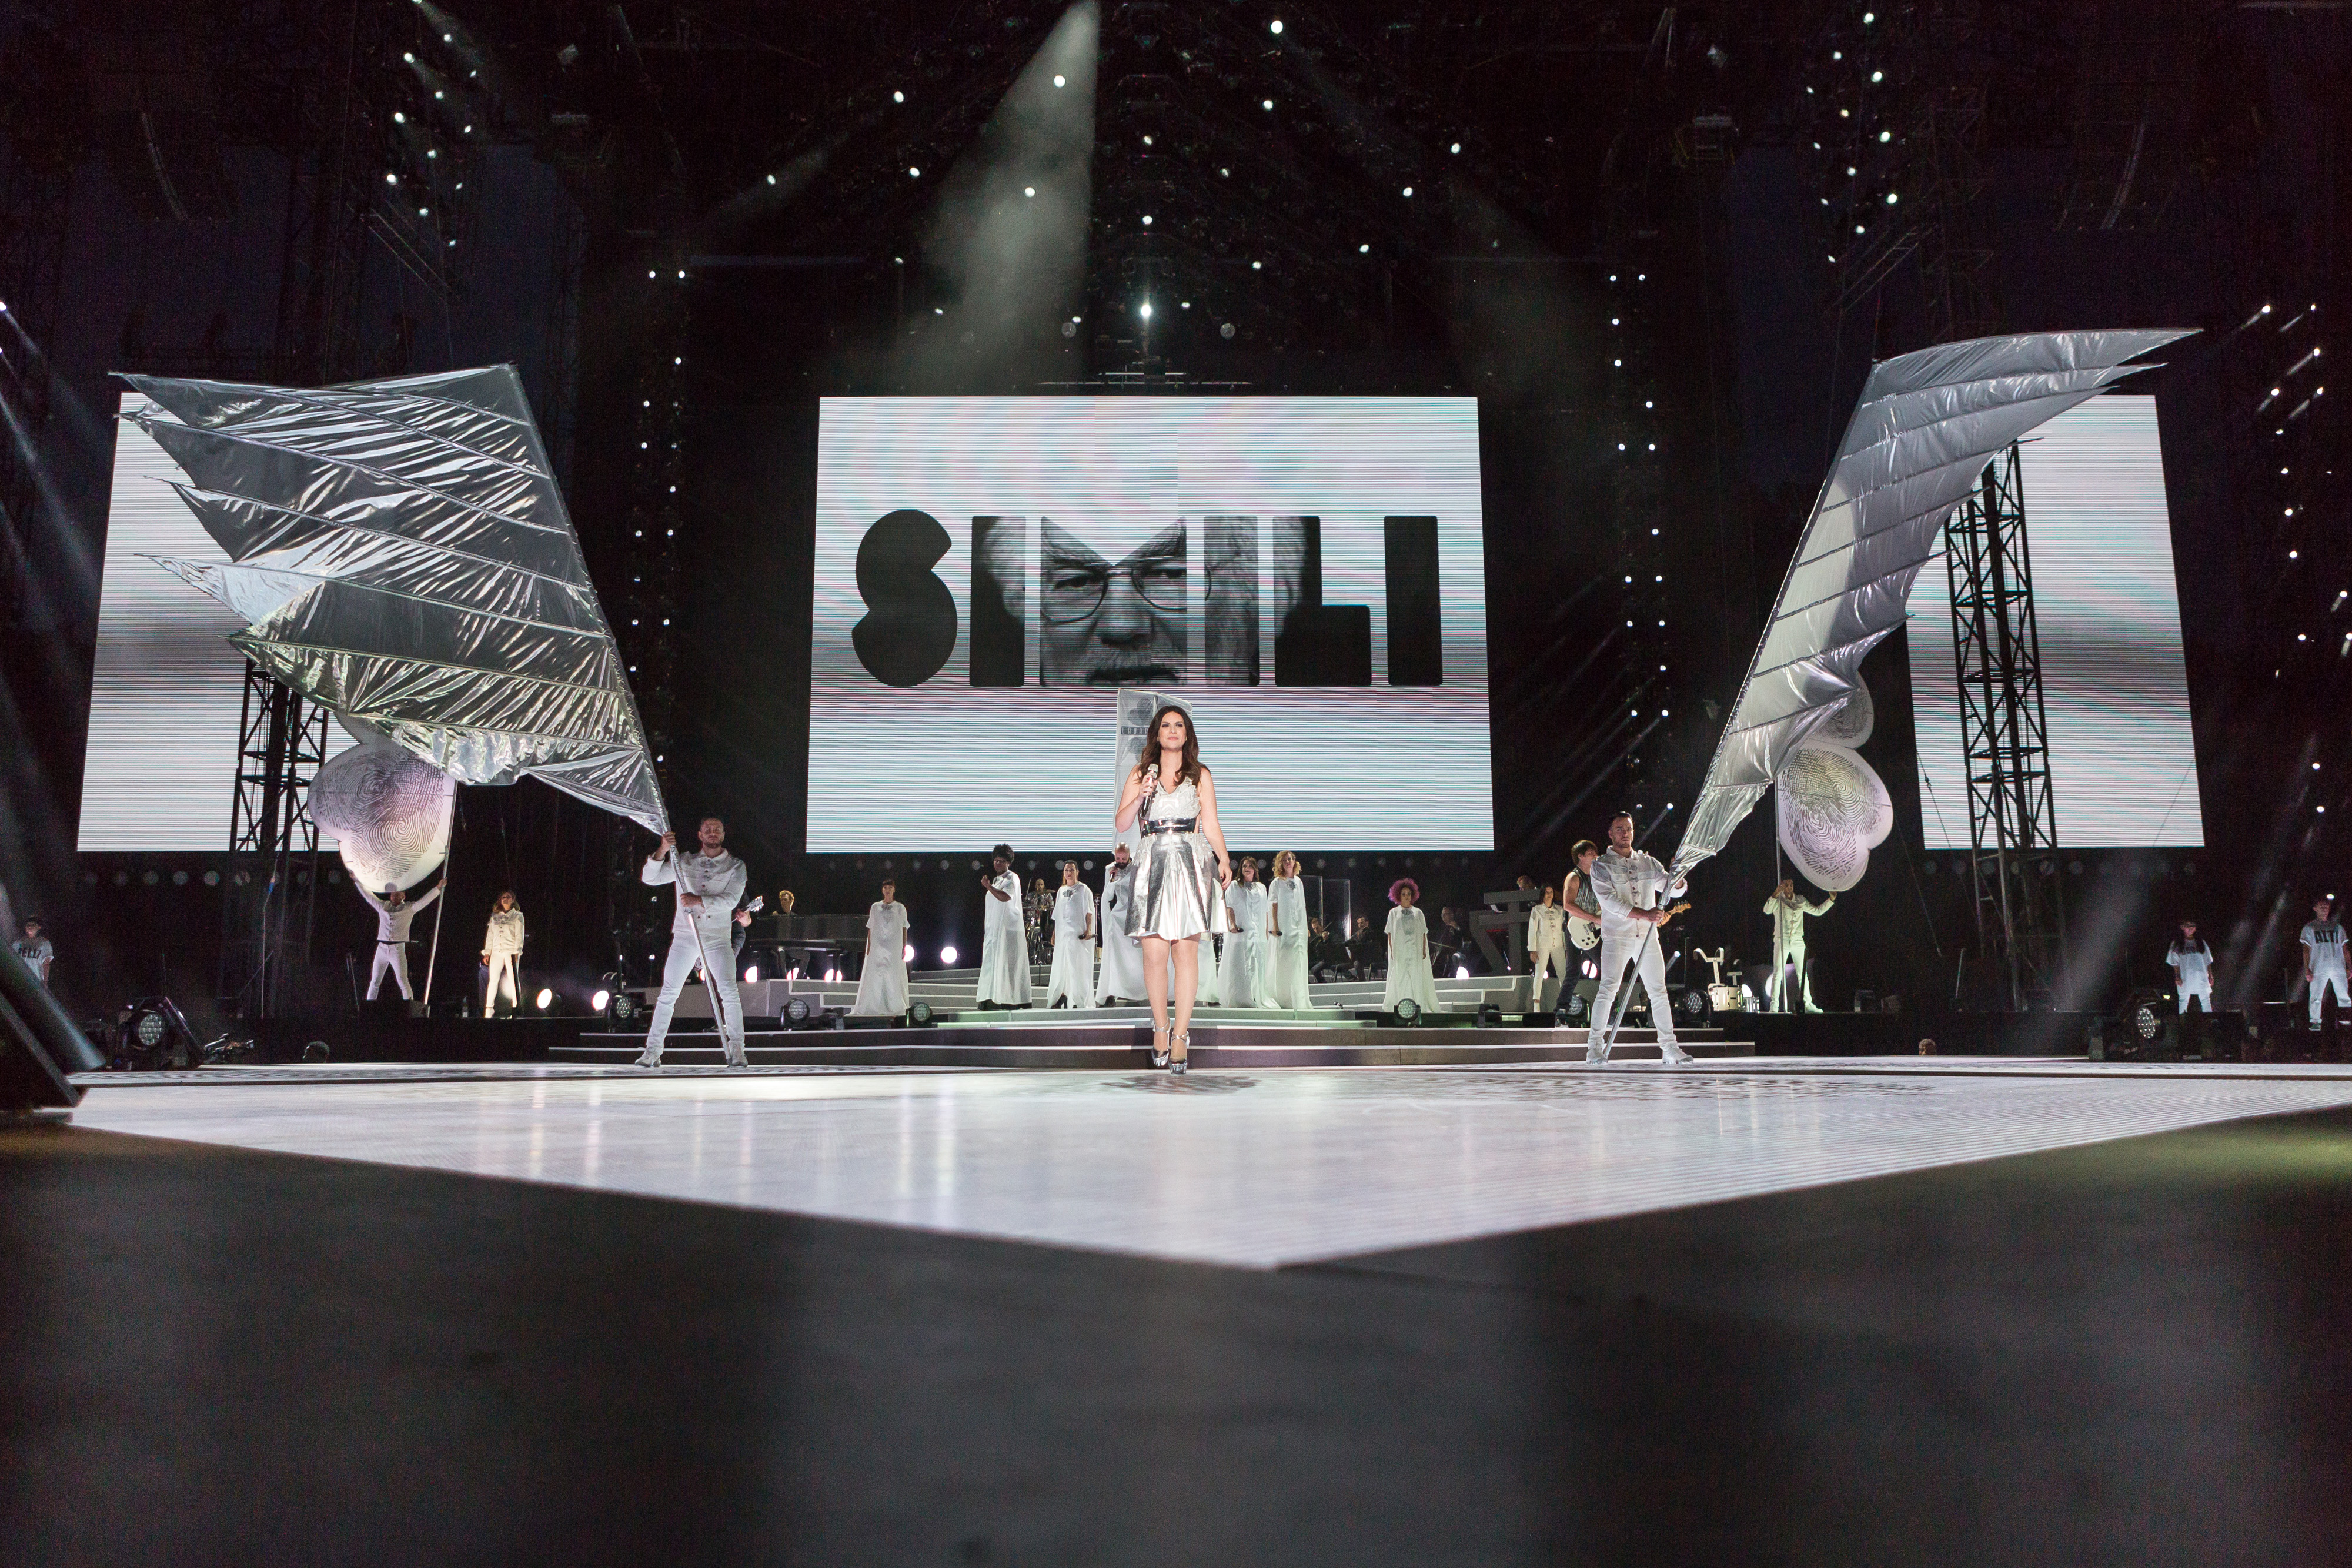 Laura Pausini live @ Stadio San Siro ph Naphtalina